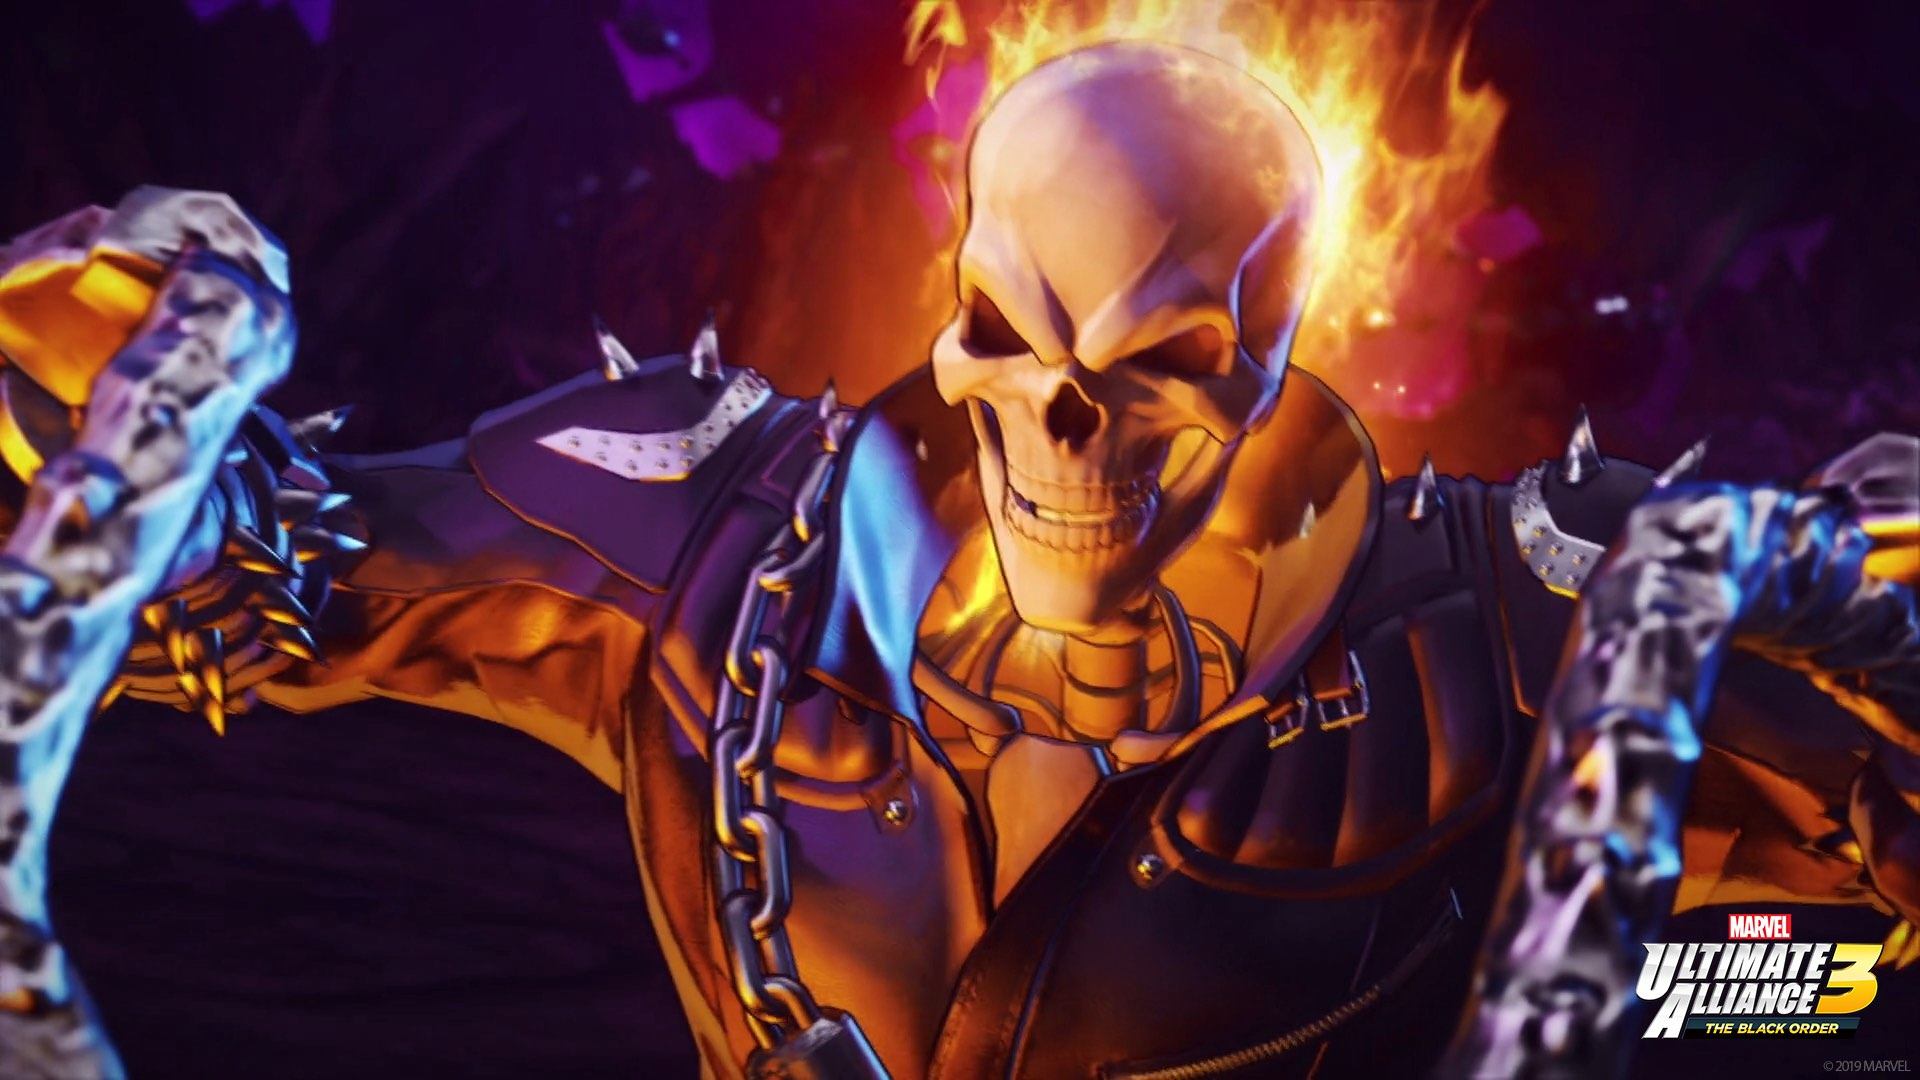 Marvel Ultimate Alliance 3: The Black Order E3 2019 Screenshot 10